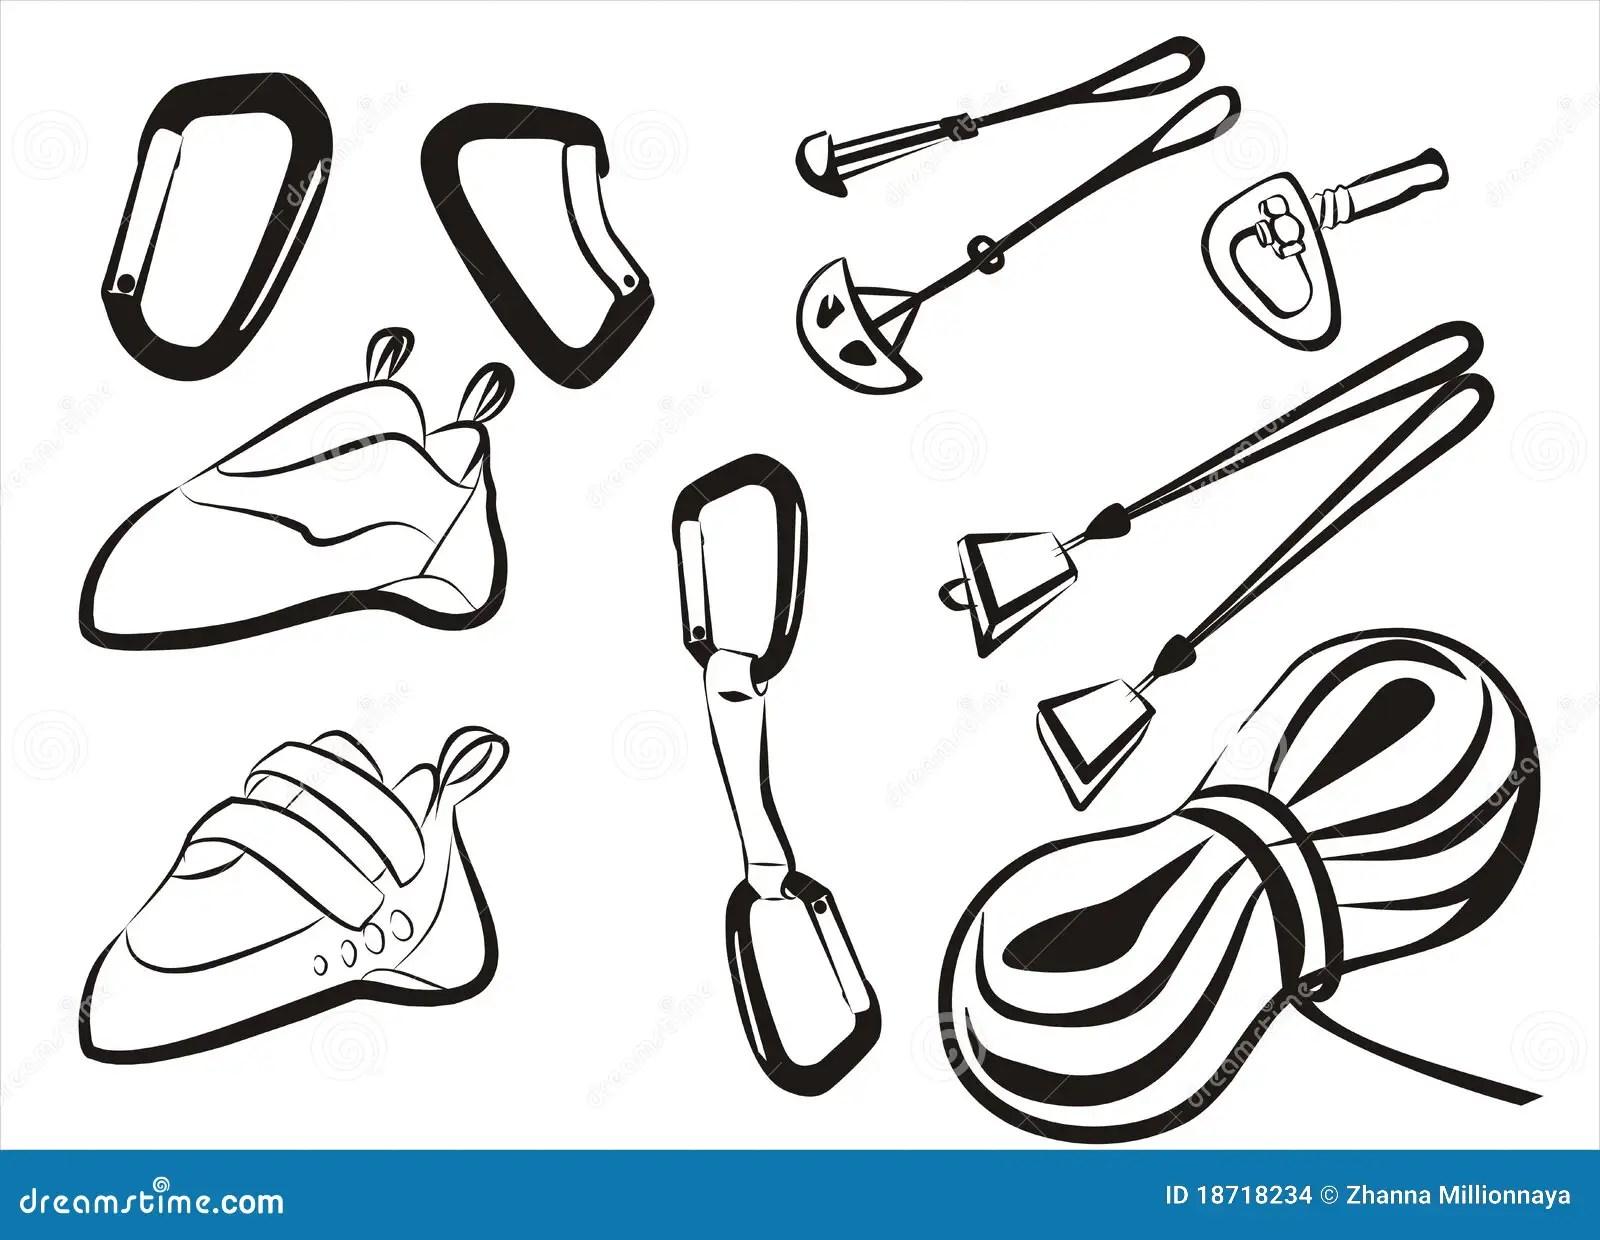 Climbing Equipment Goods And Stuff Stock Vector